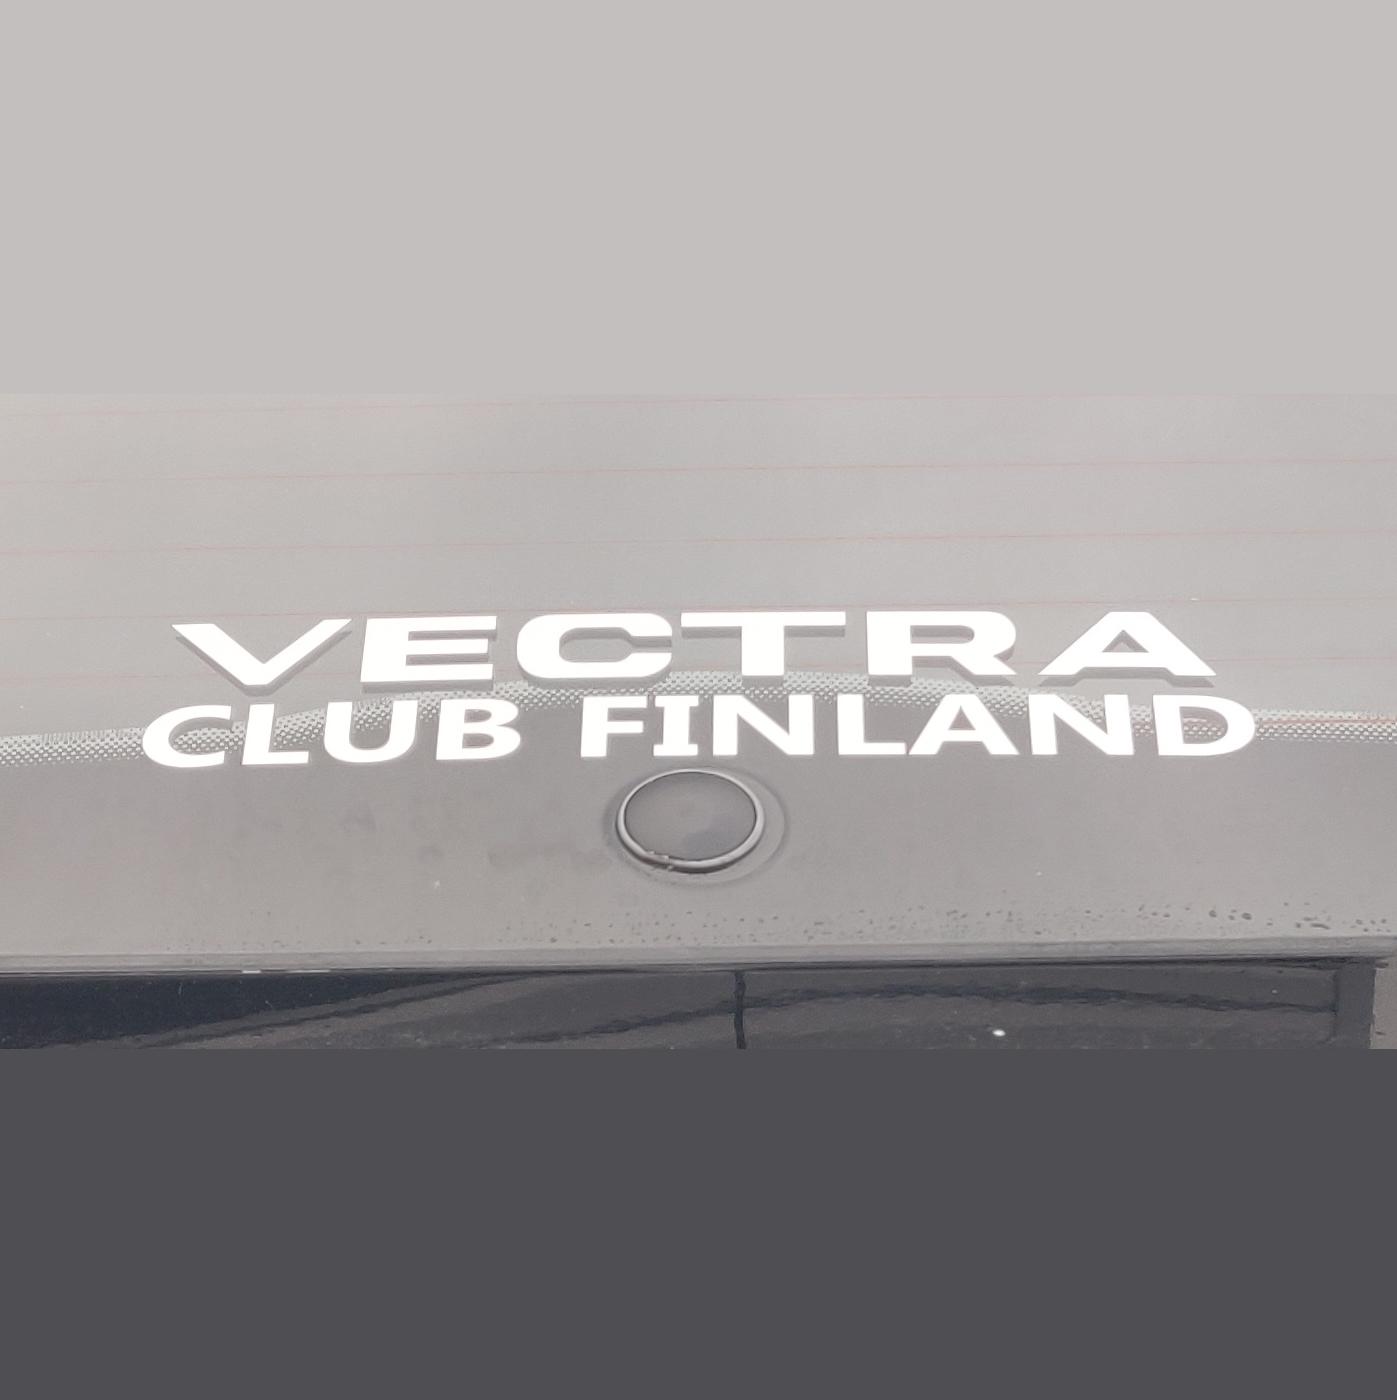 Vectra Club Finland